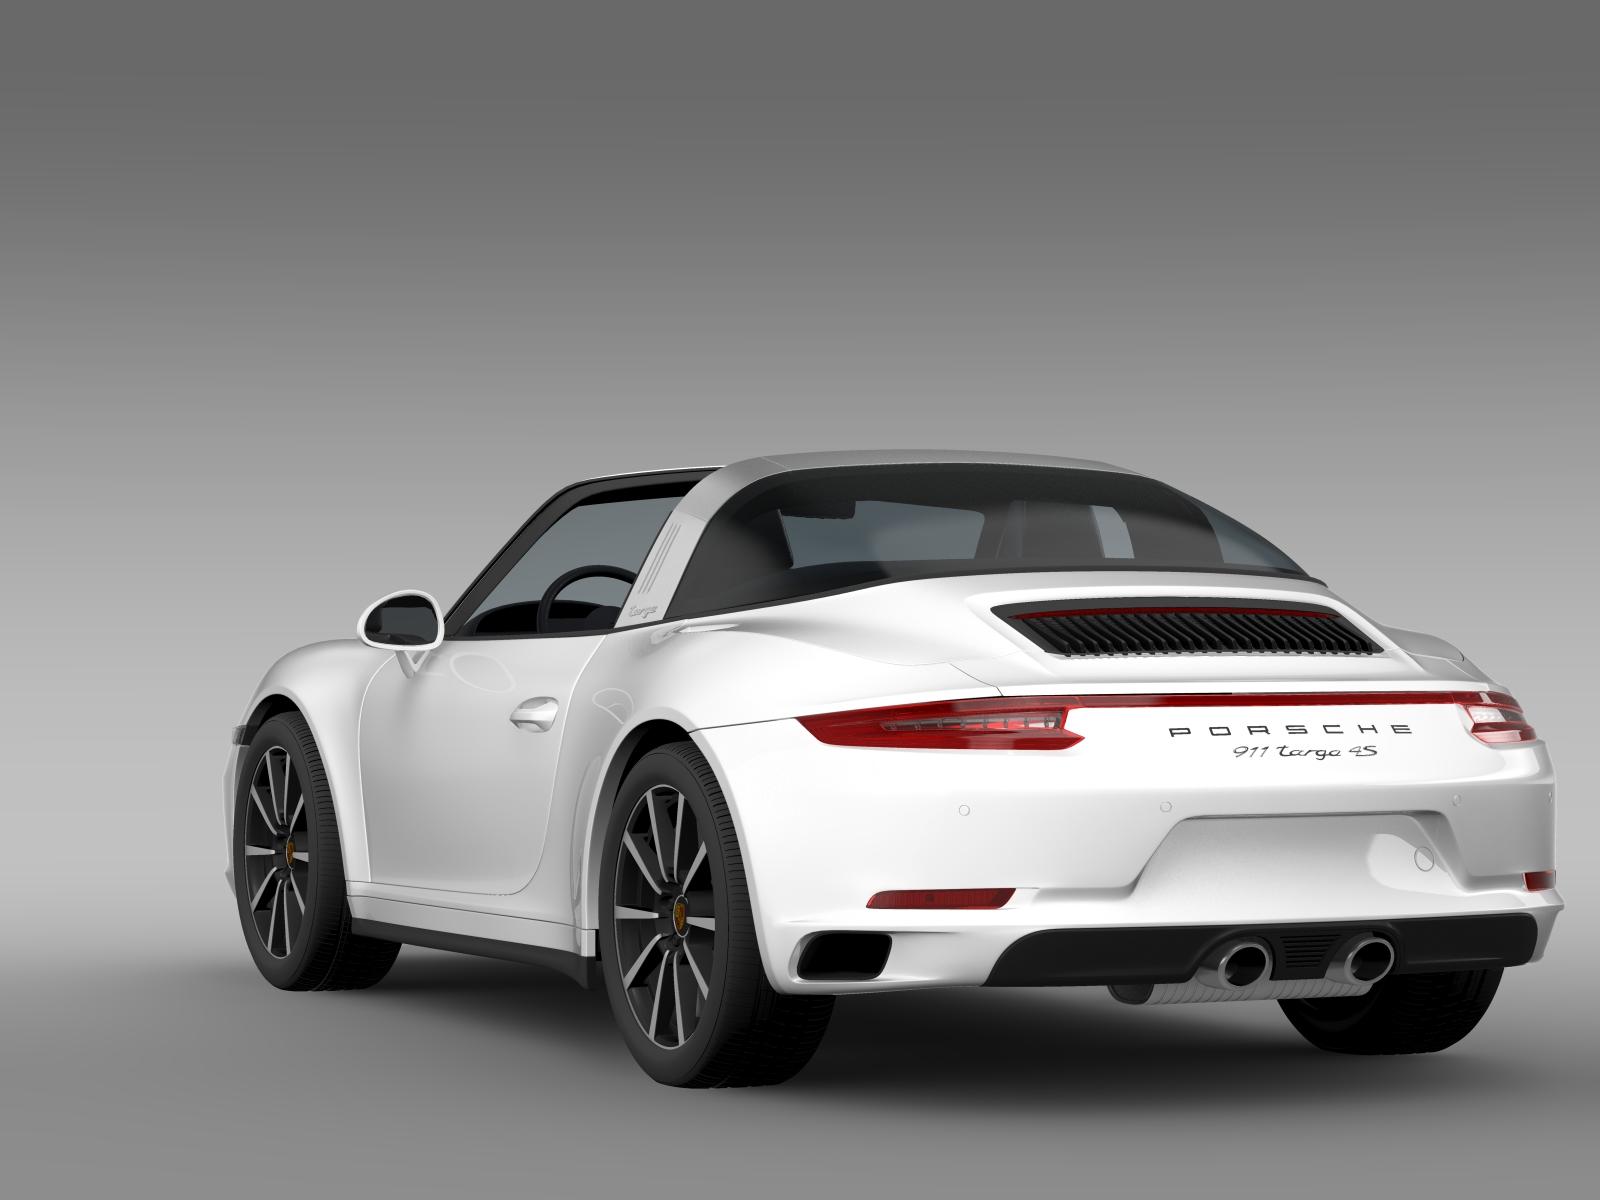 porsche 911 targa 4s 991 2016 3d model buy porsche 911. Black Bedroom Furniture Sets. Home Design Ideas